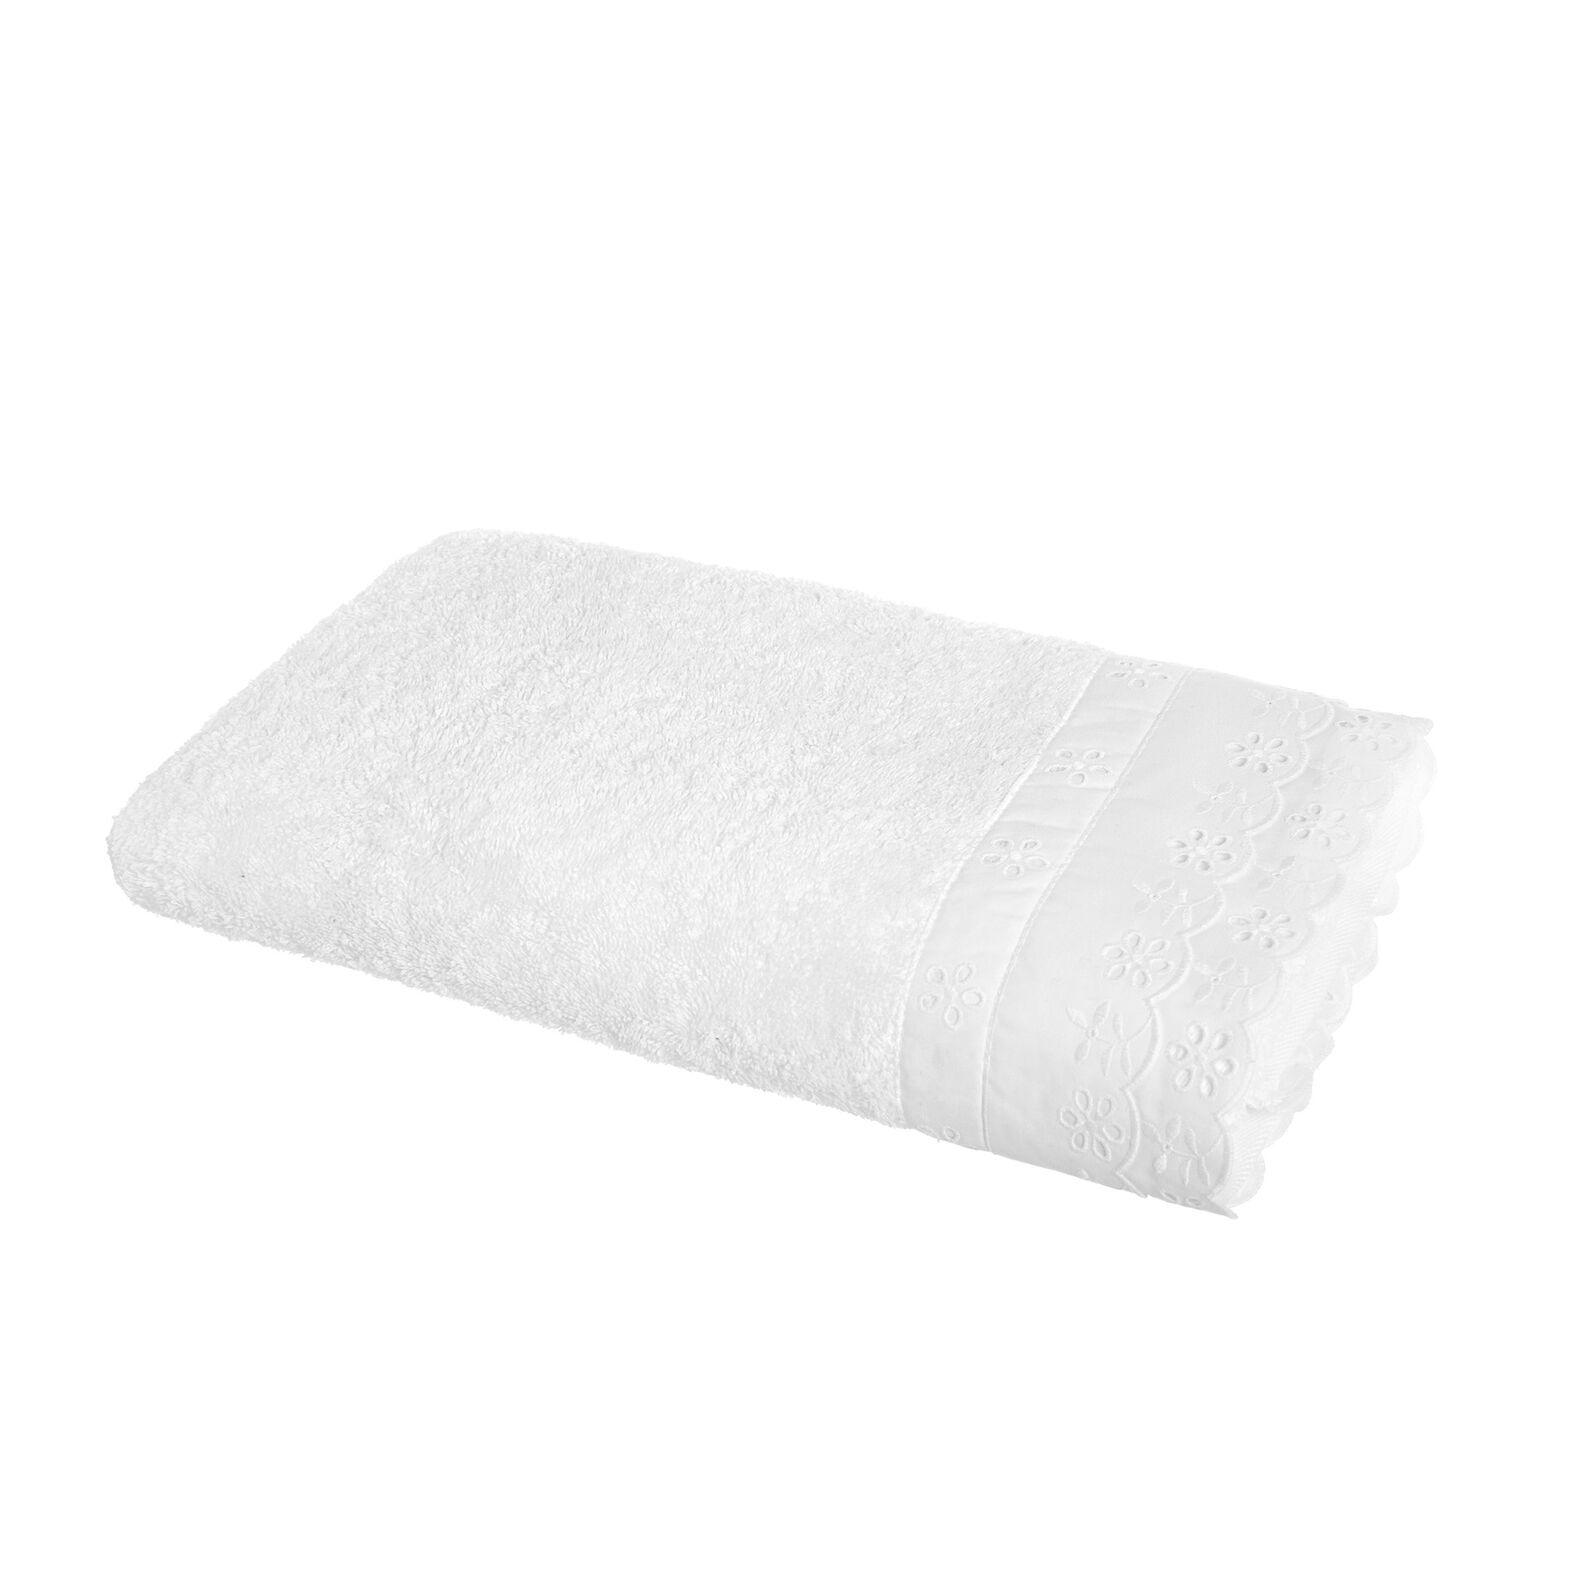 Portofino broderie towel